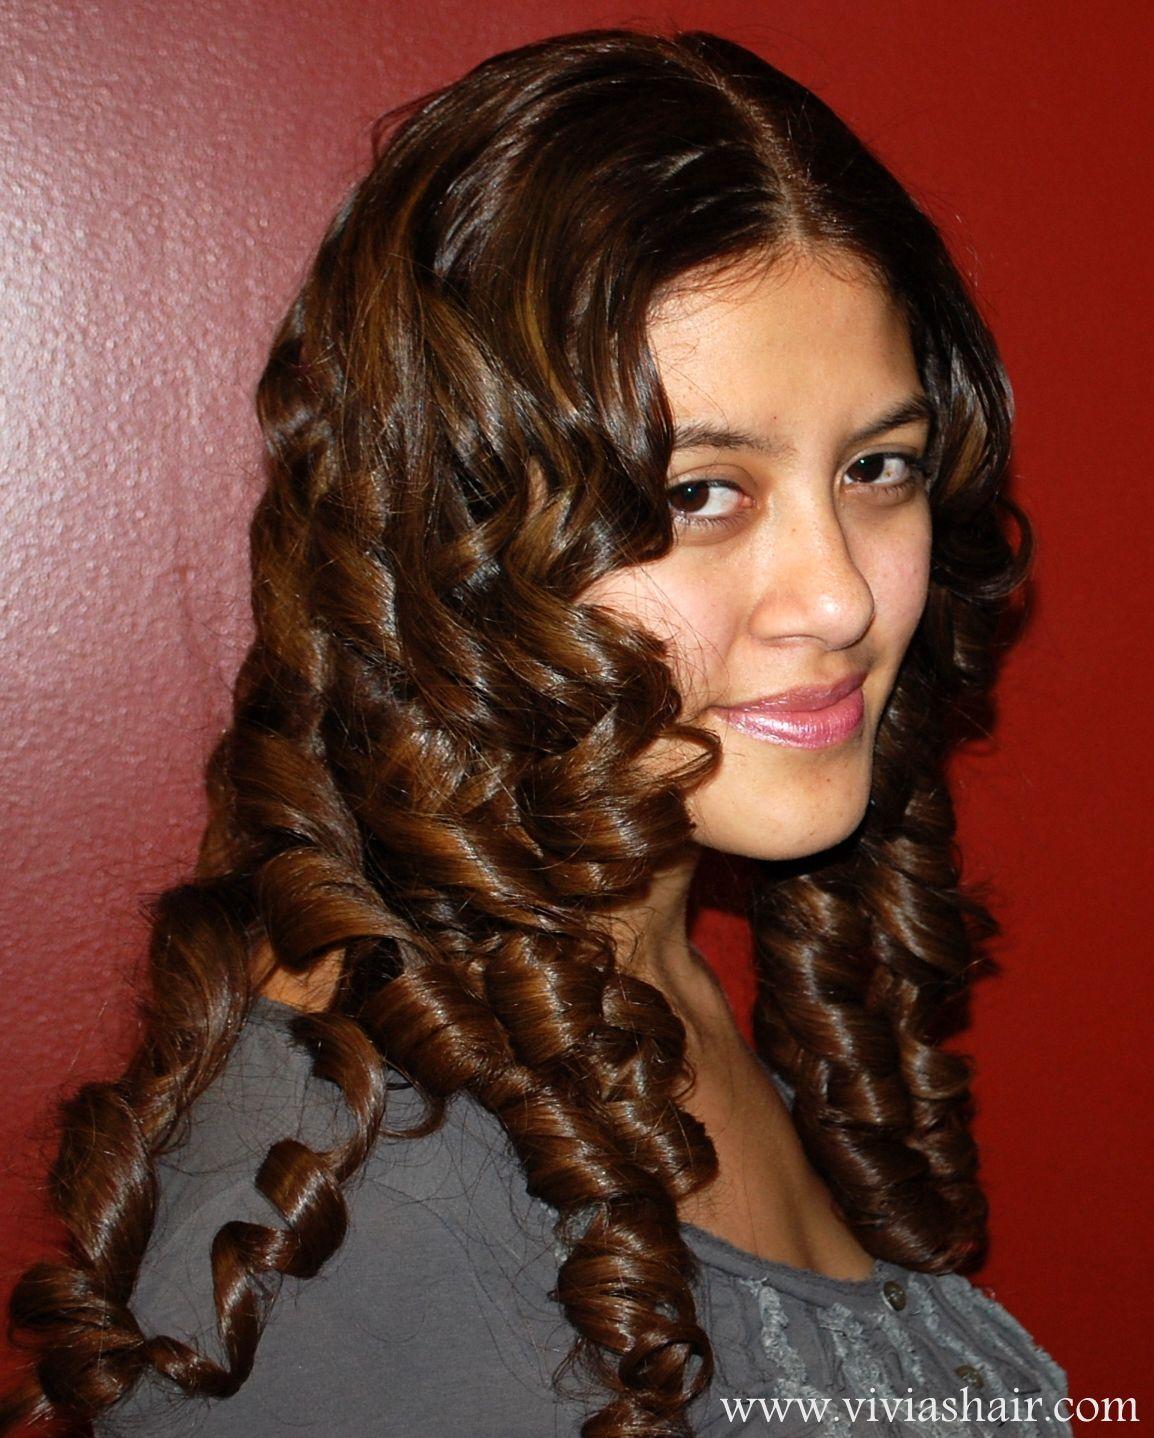 Hair Extensions Va Hair Salon Woodbridge Va Hair Salon Near Me